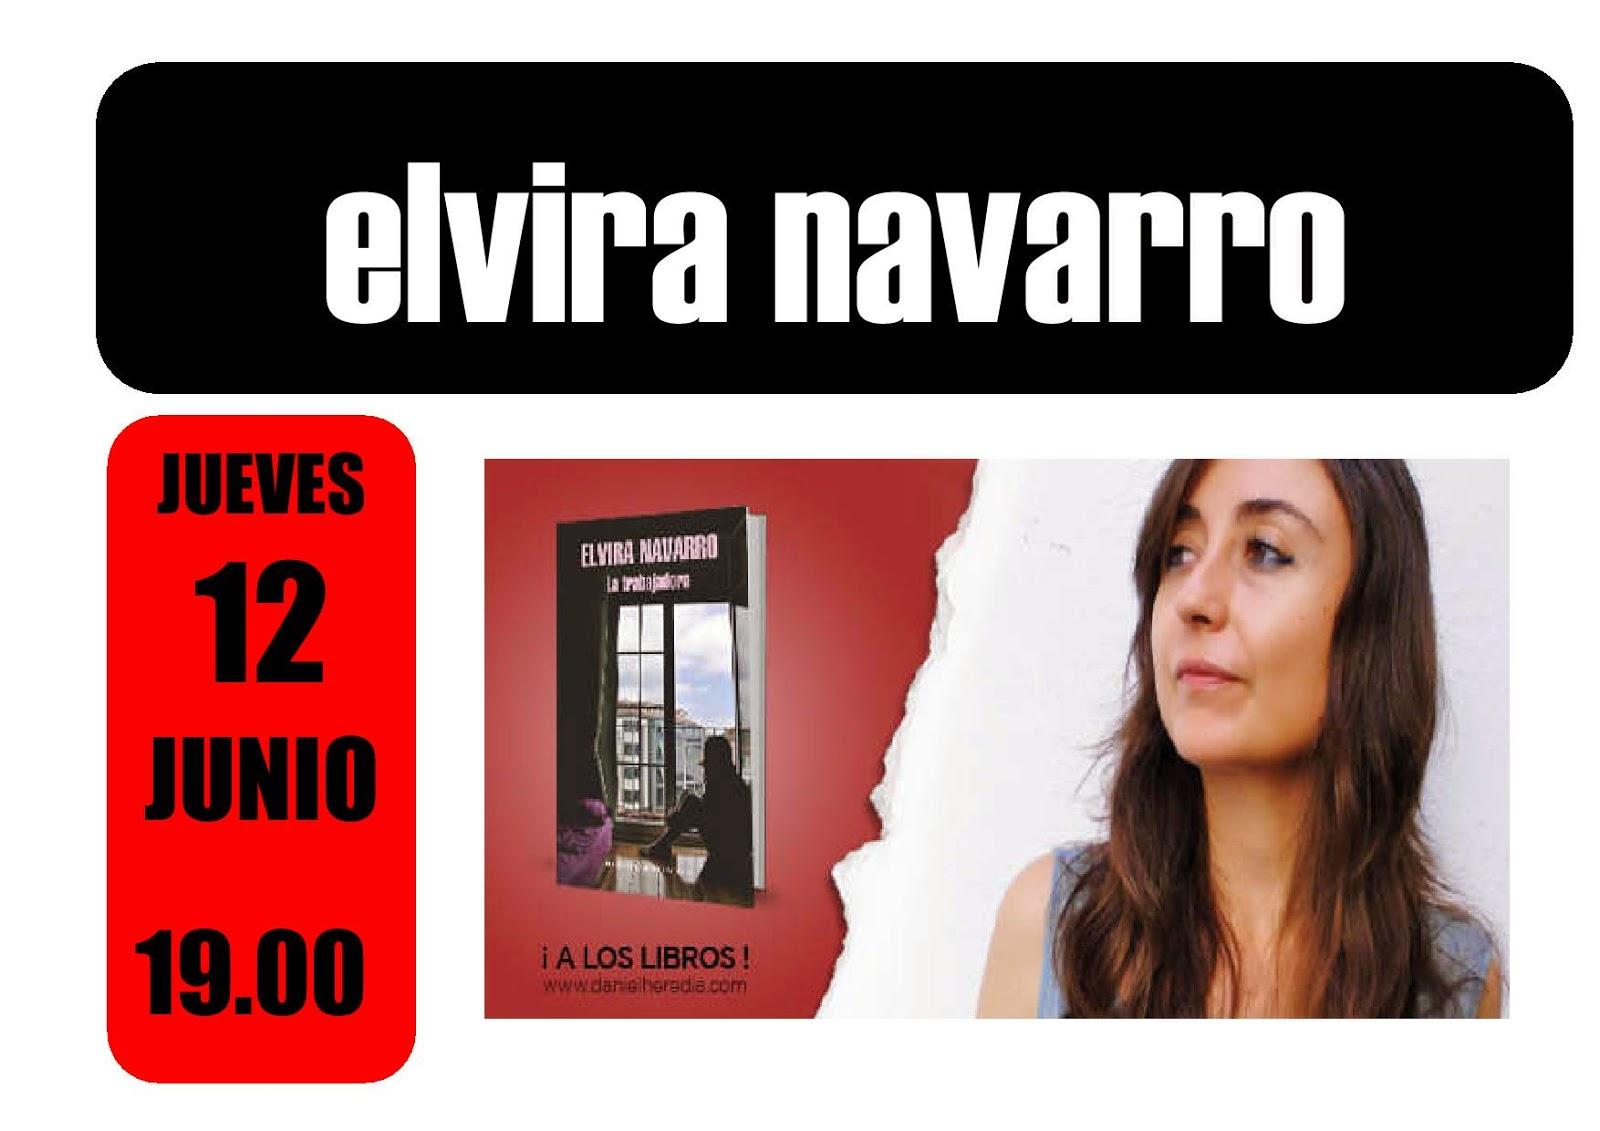 http://larevistademuga.blogspot.com.es/p/elvira-navarro-en-muga.html